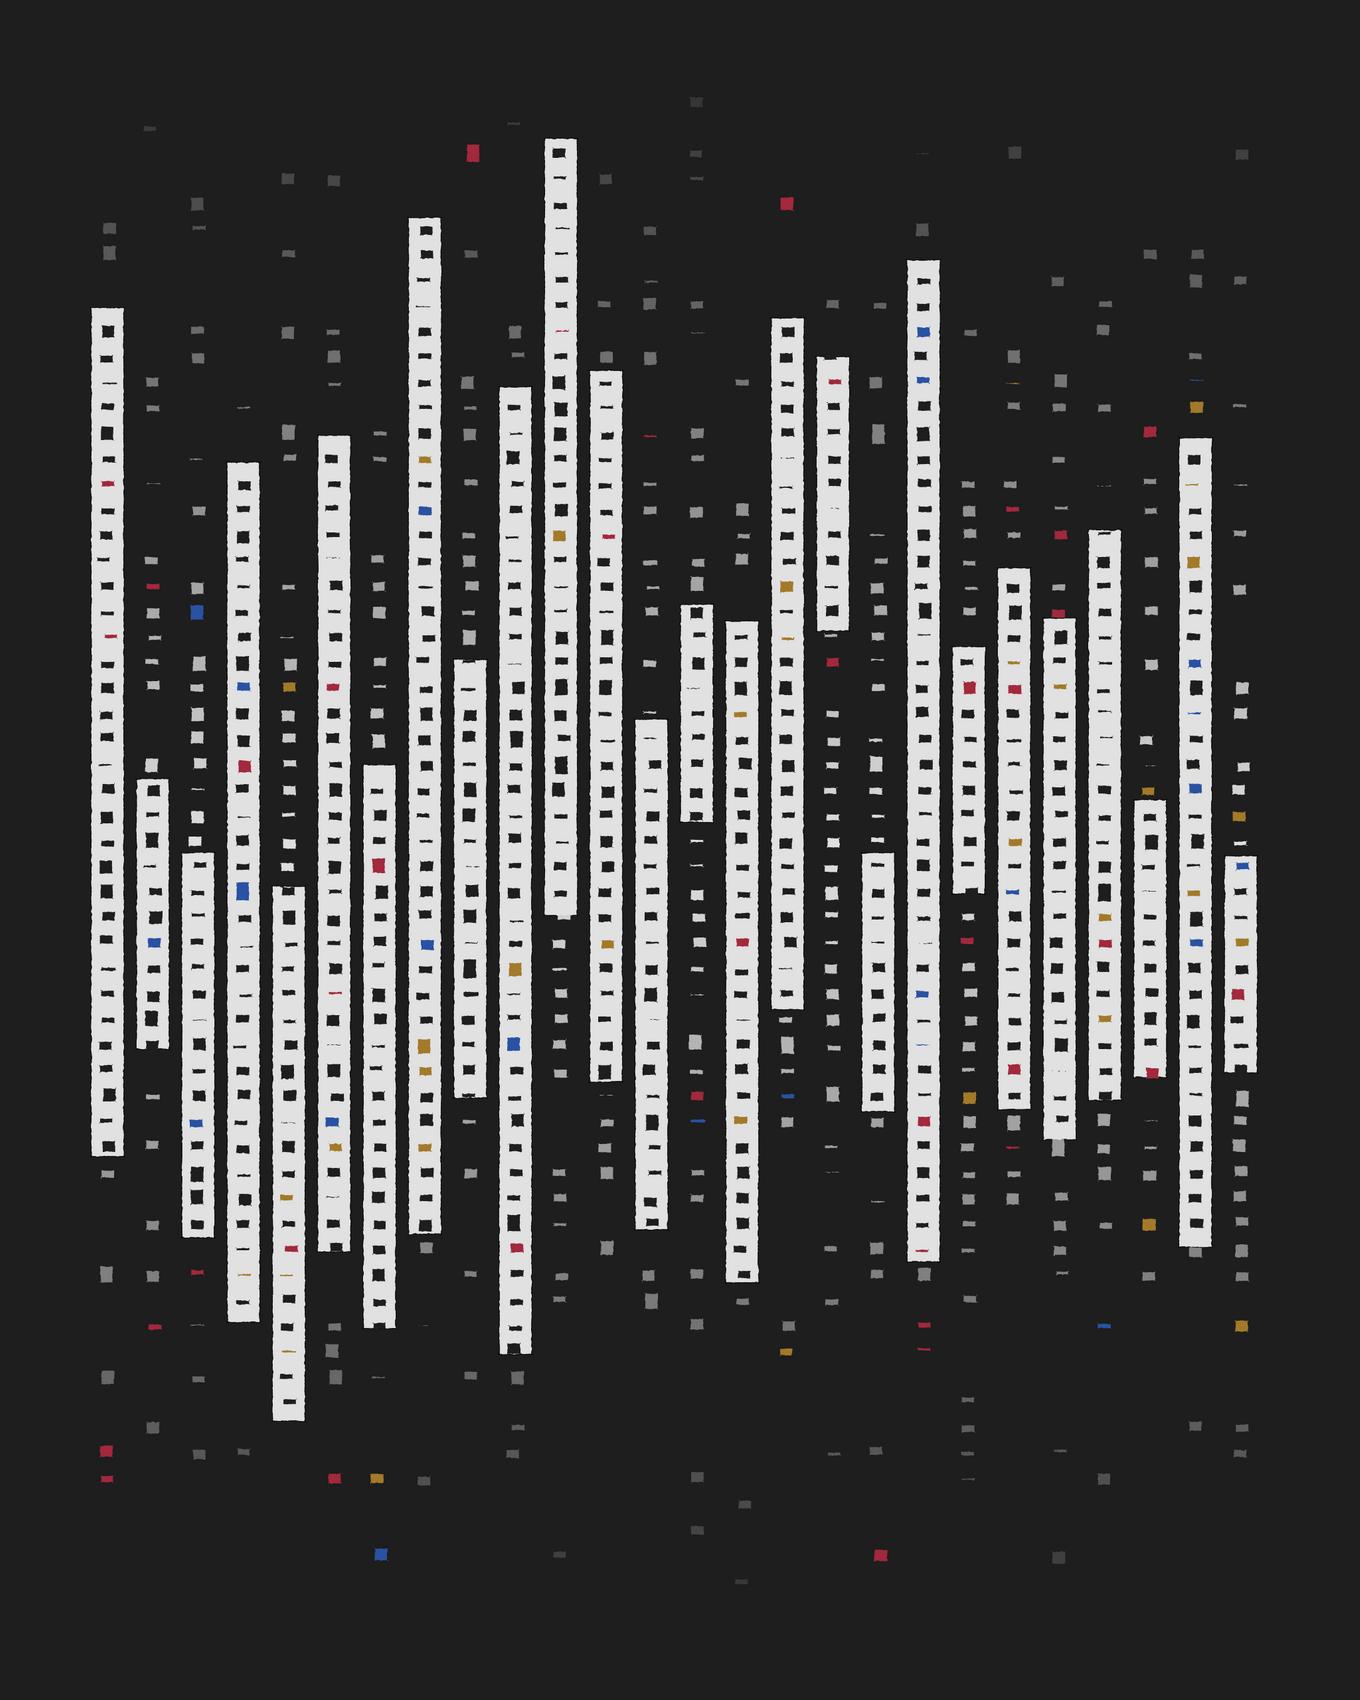 Domino Dancing Inverted